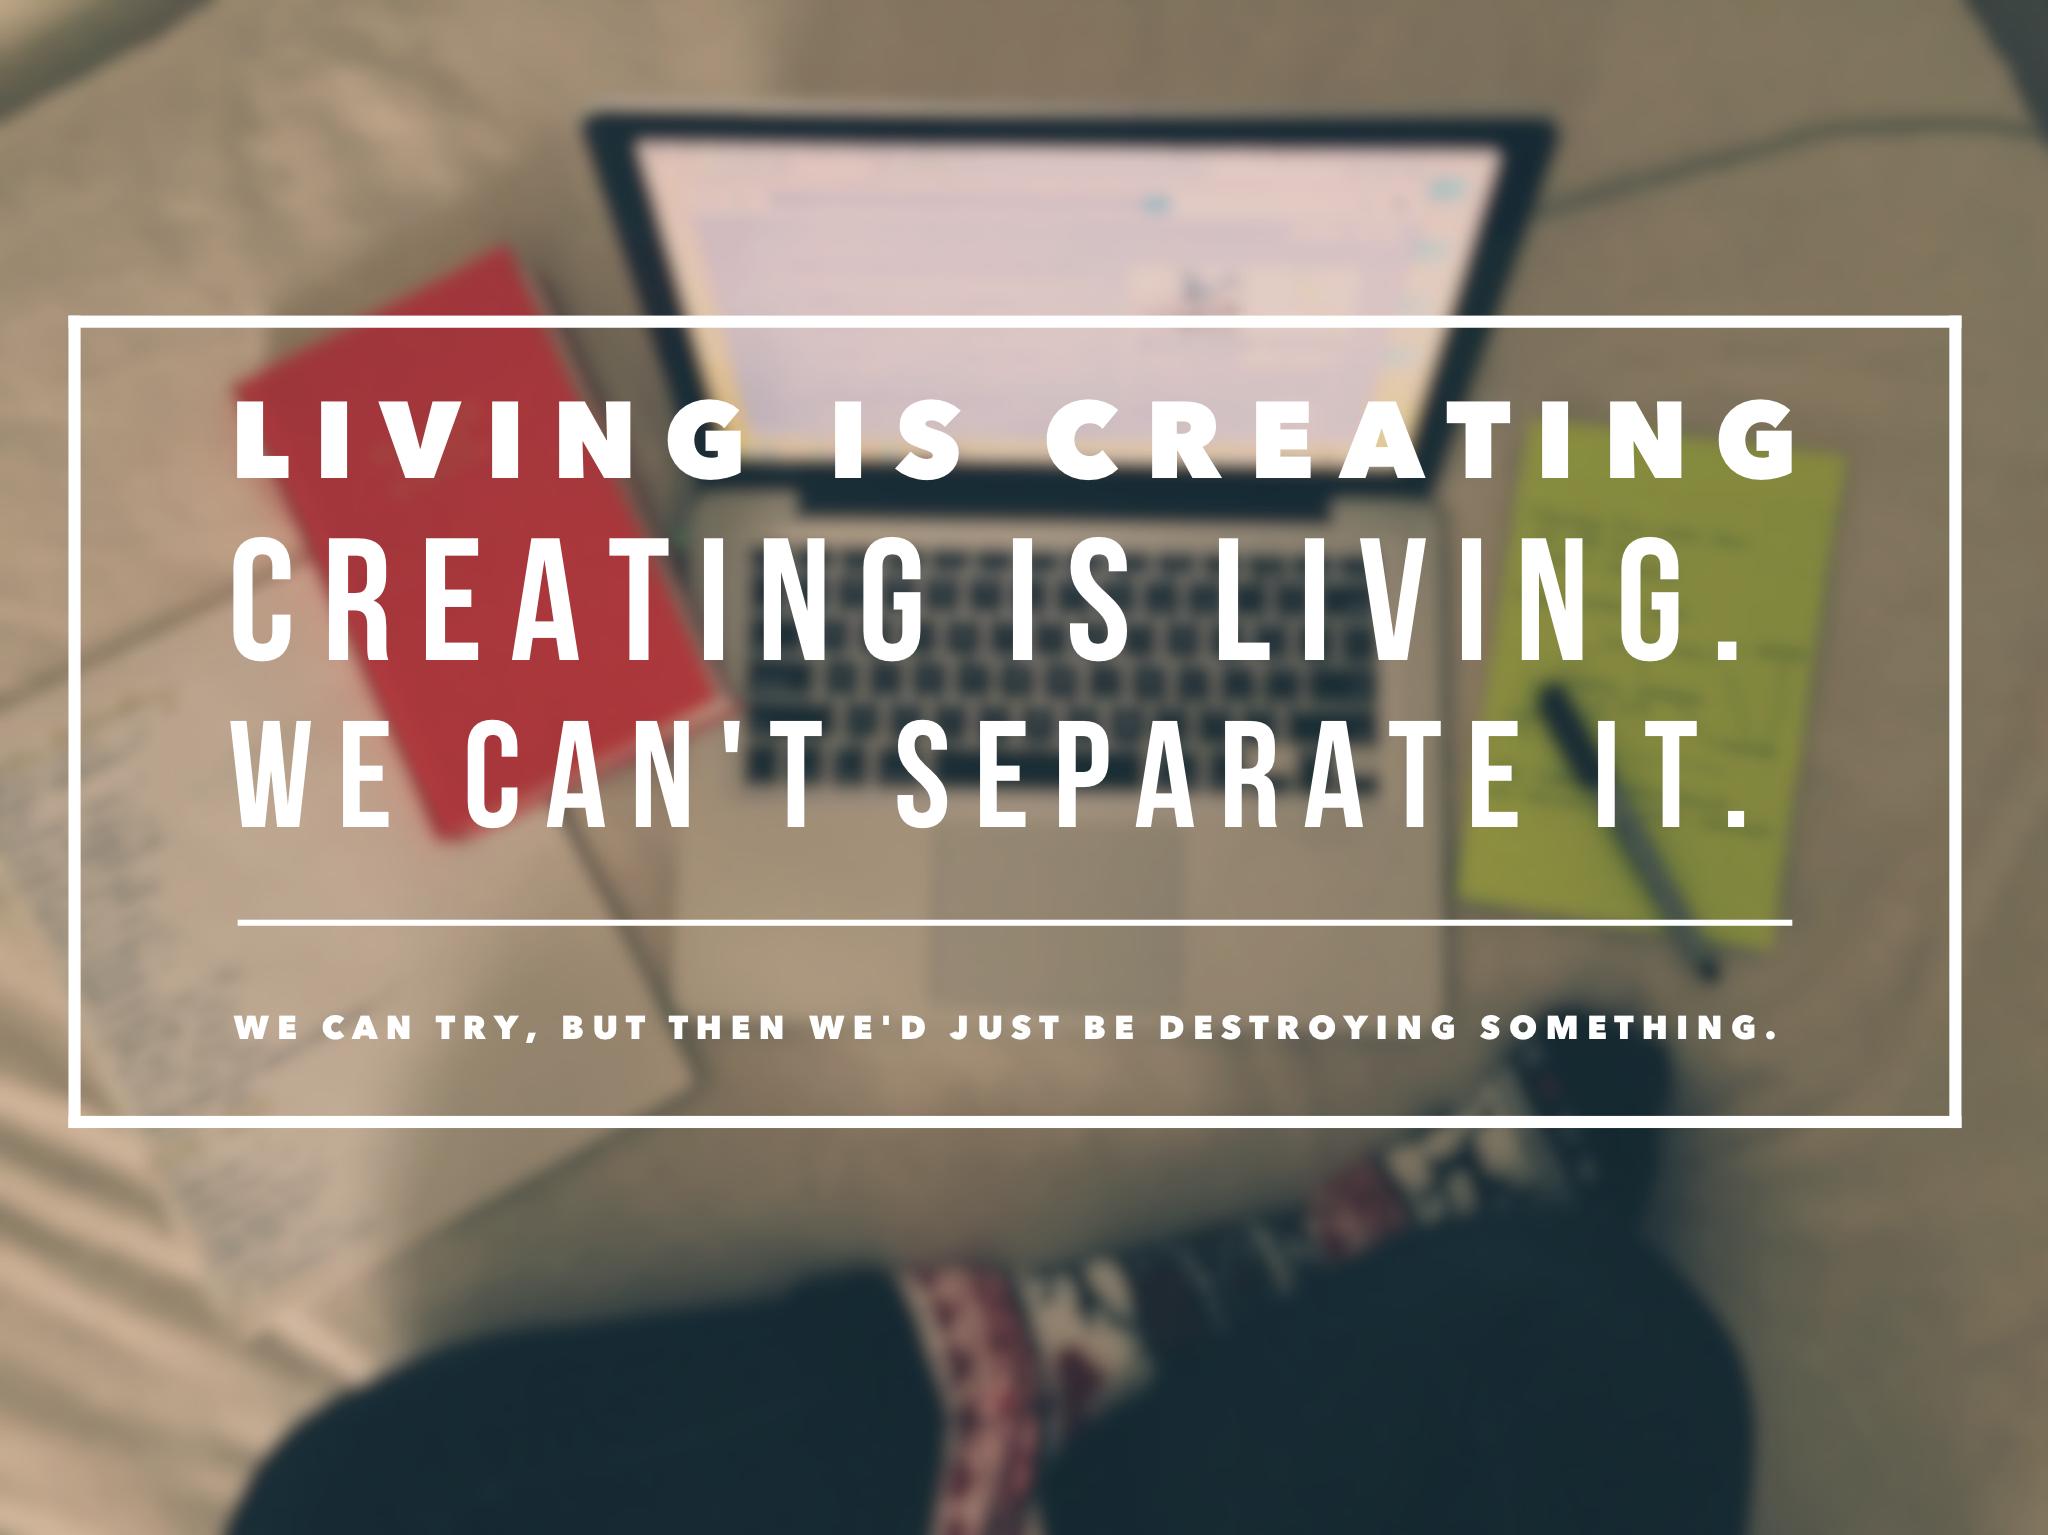 creating/destroying